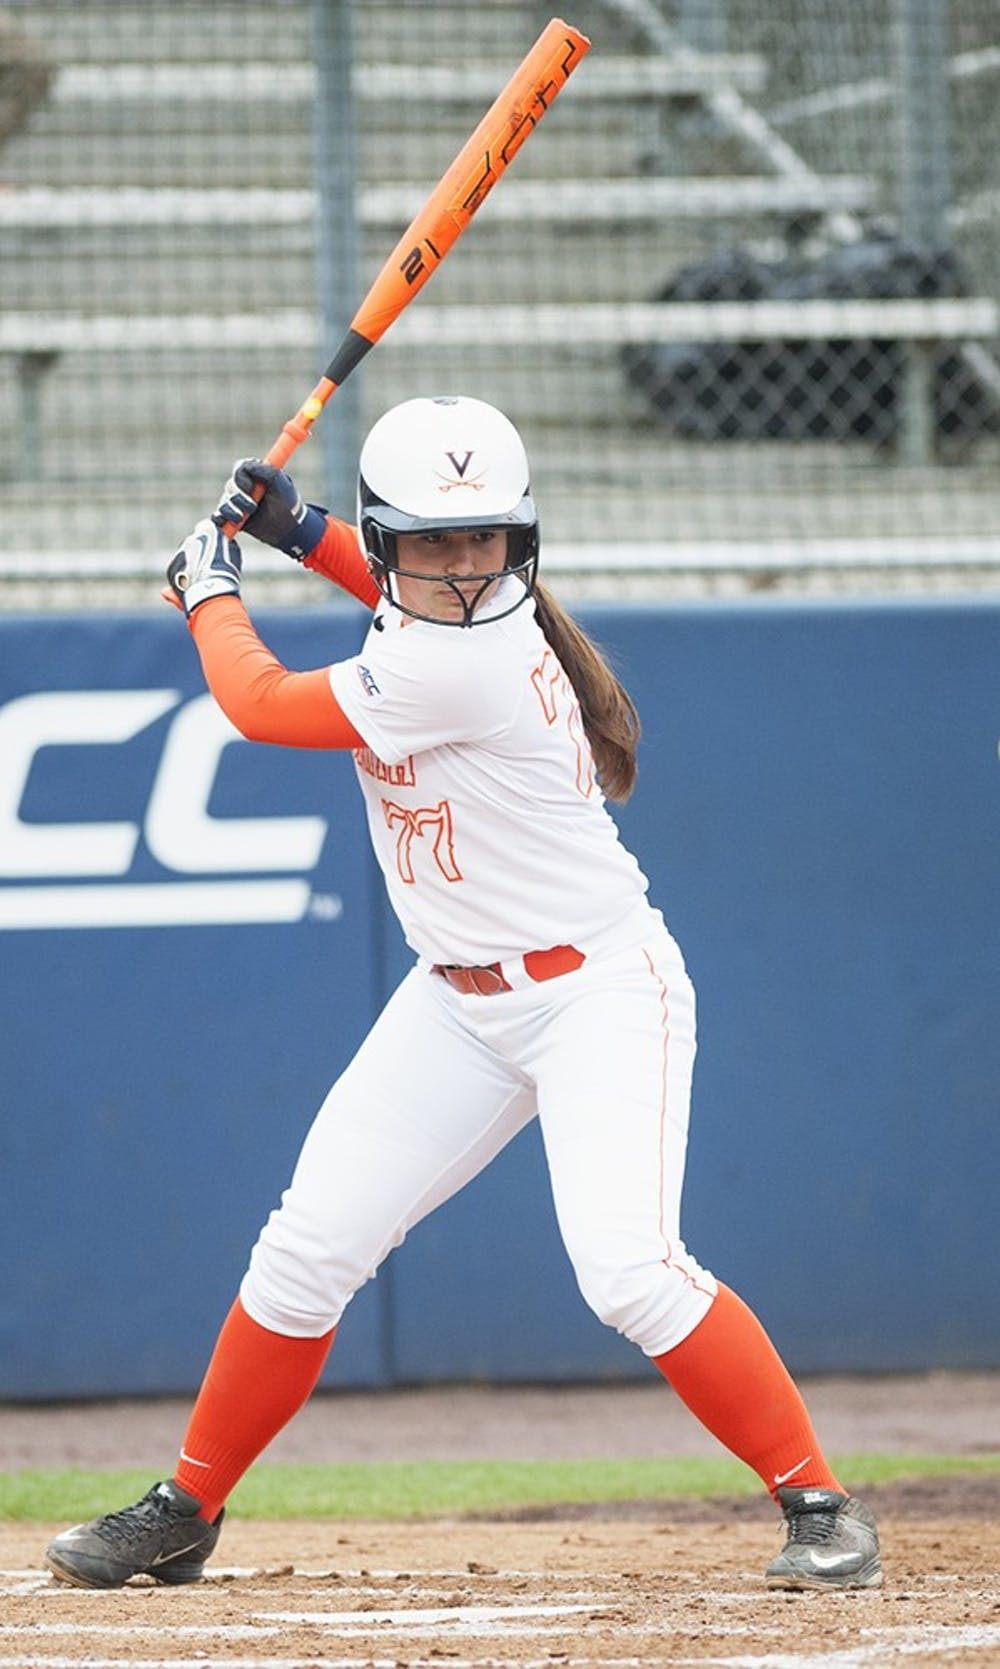 <p>Sophomore infielder Lauren Heintzelman's three-run homer helped lead Virginia to a 4-3&nbsp;win against George Washington.</p>